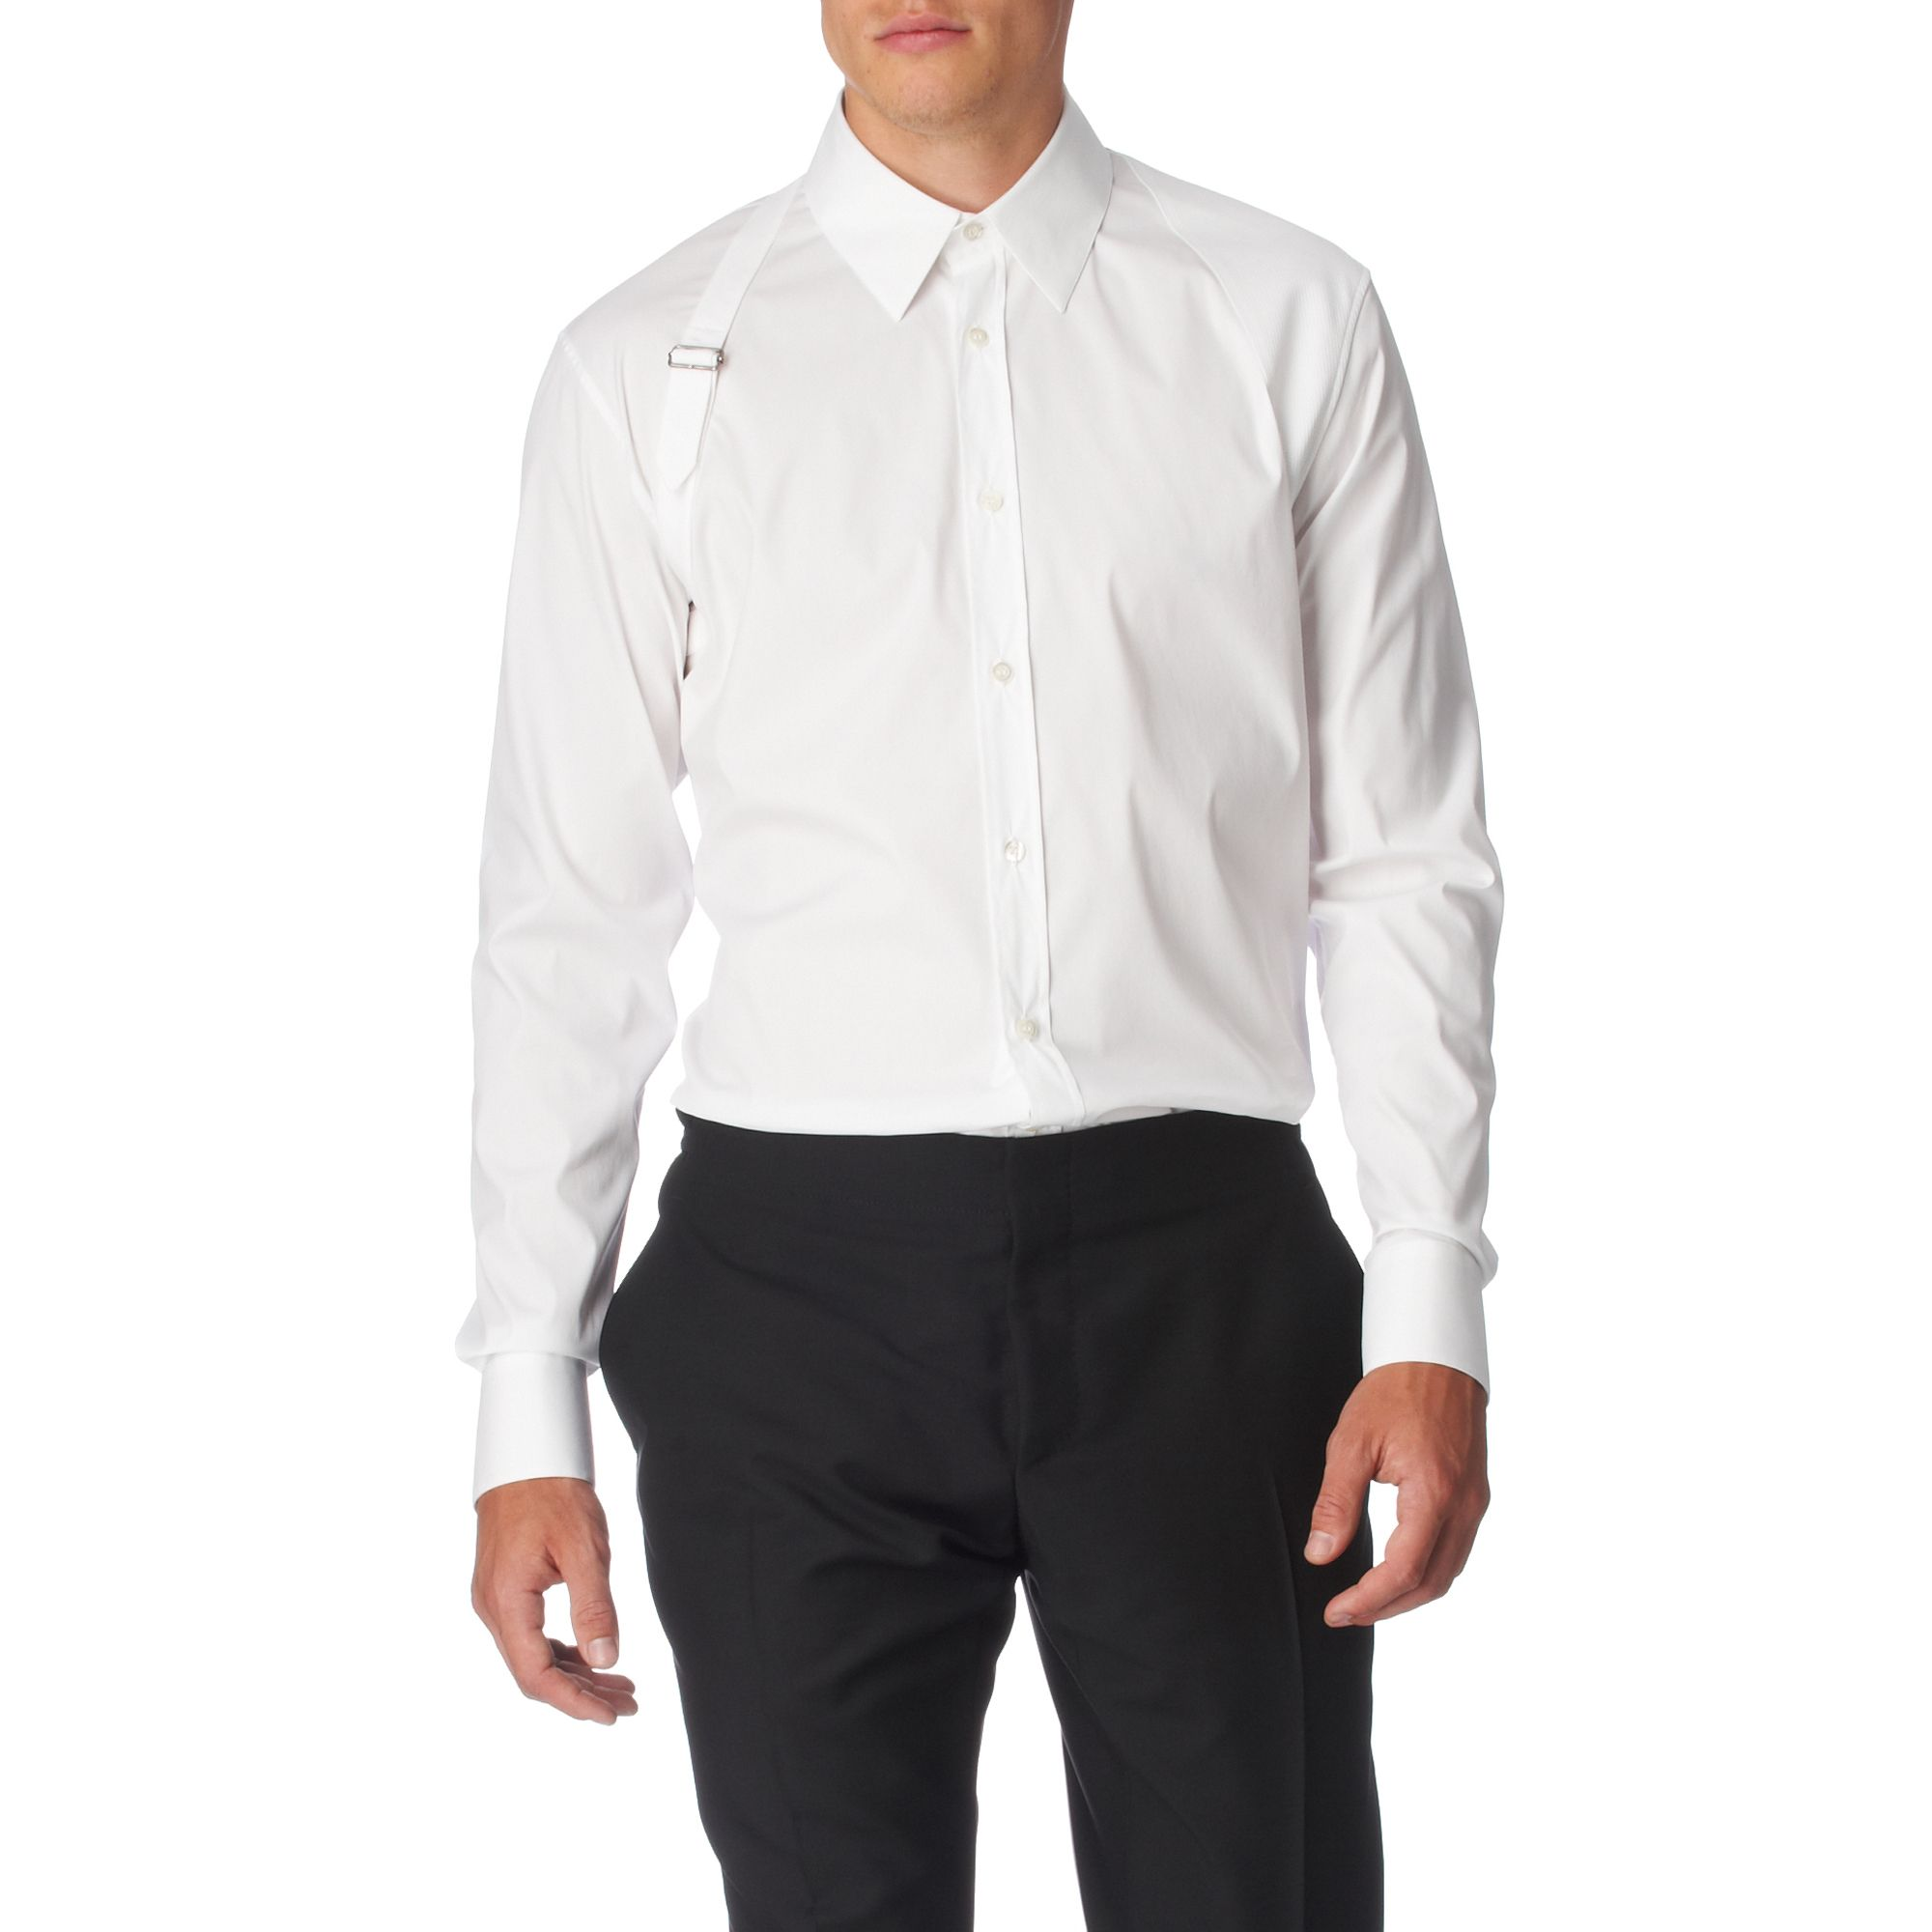 Alexander mcqueen plain harness tailored fit single cuff for Single cuff dress shirt